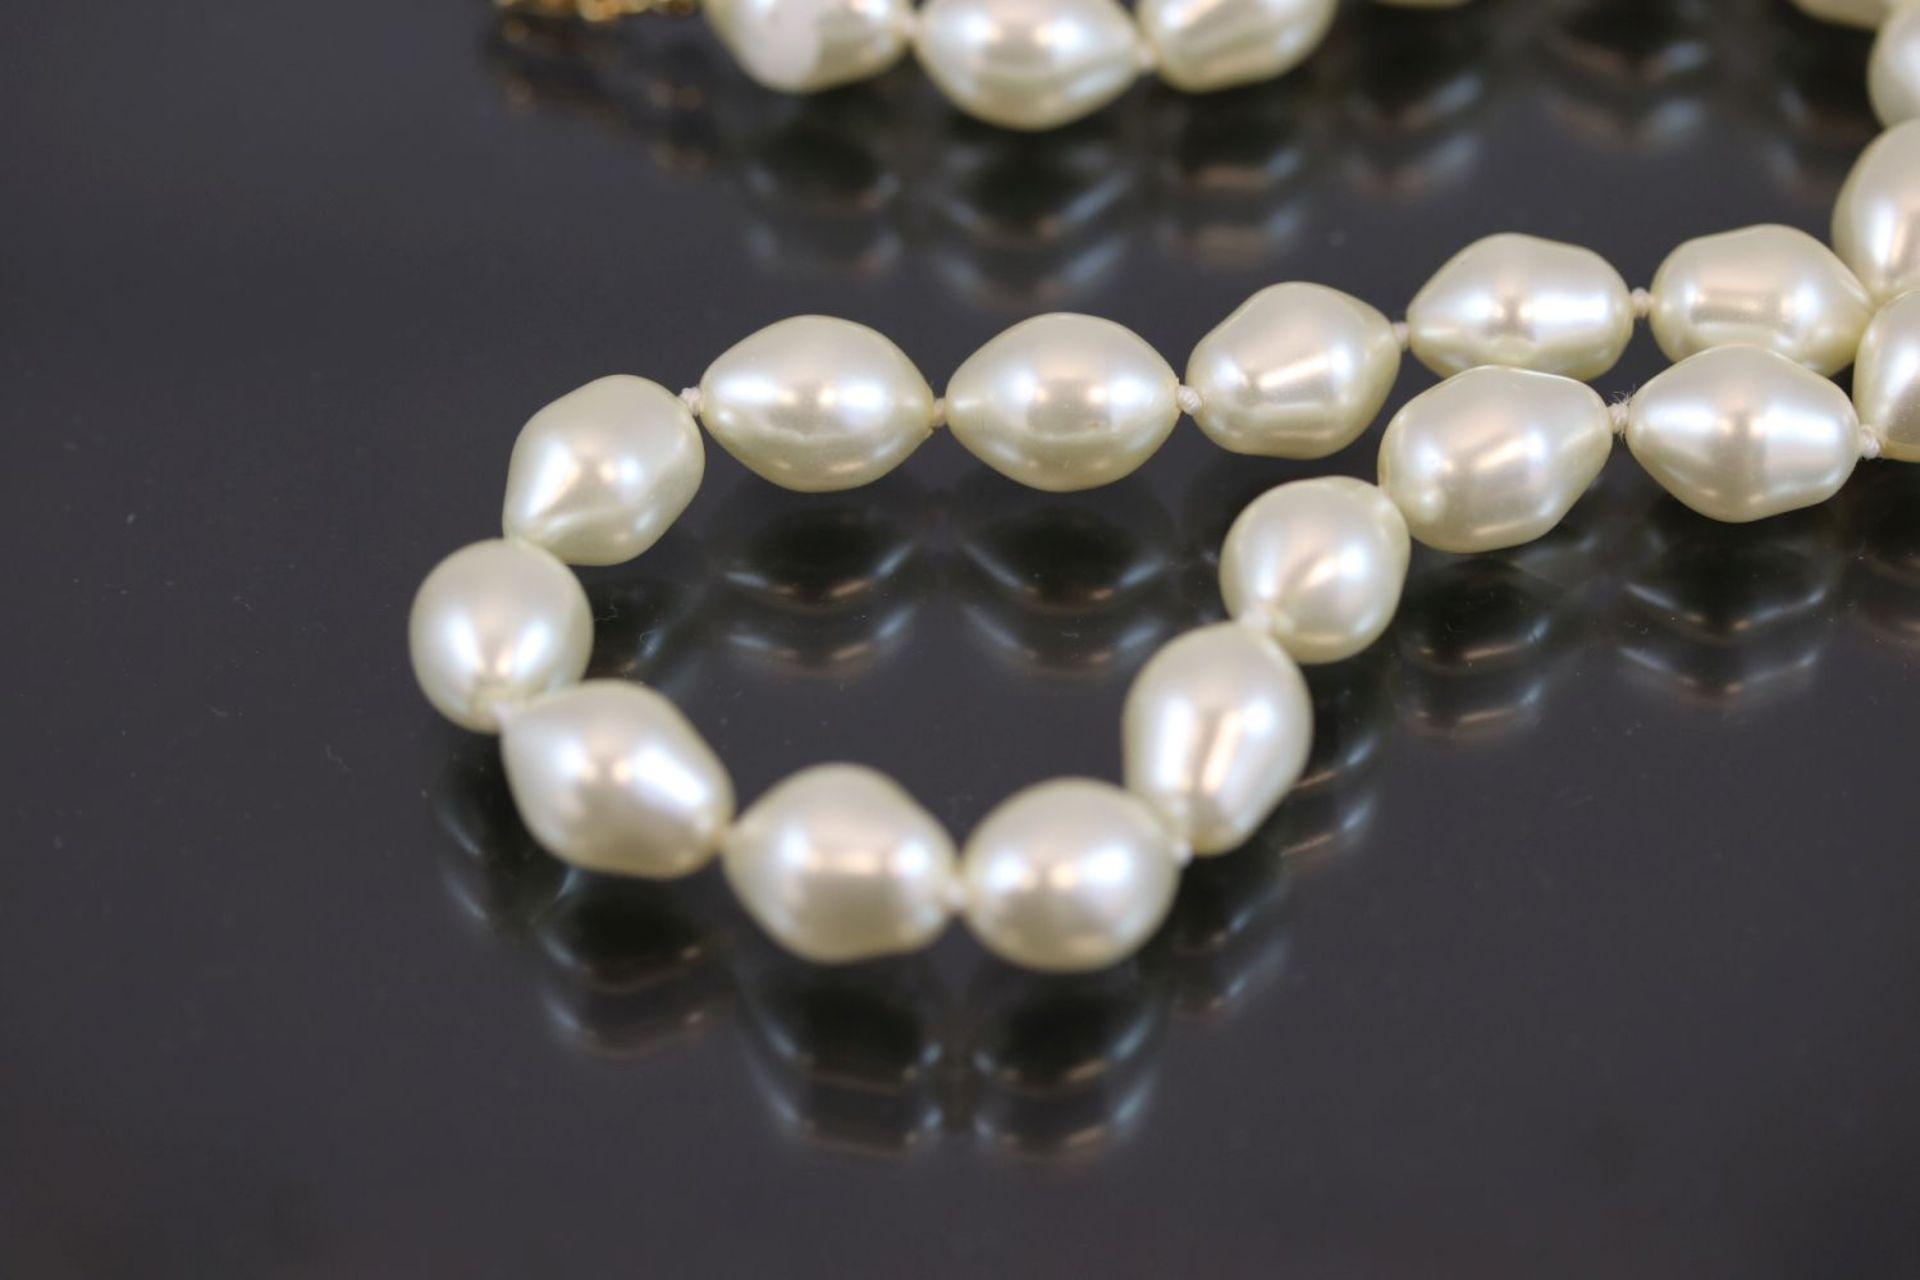 Los 40 - Perlenkette, Verschluß Metall vergoldetLänge: 47 cm